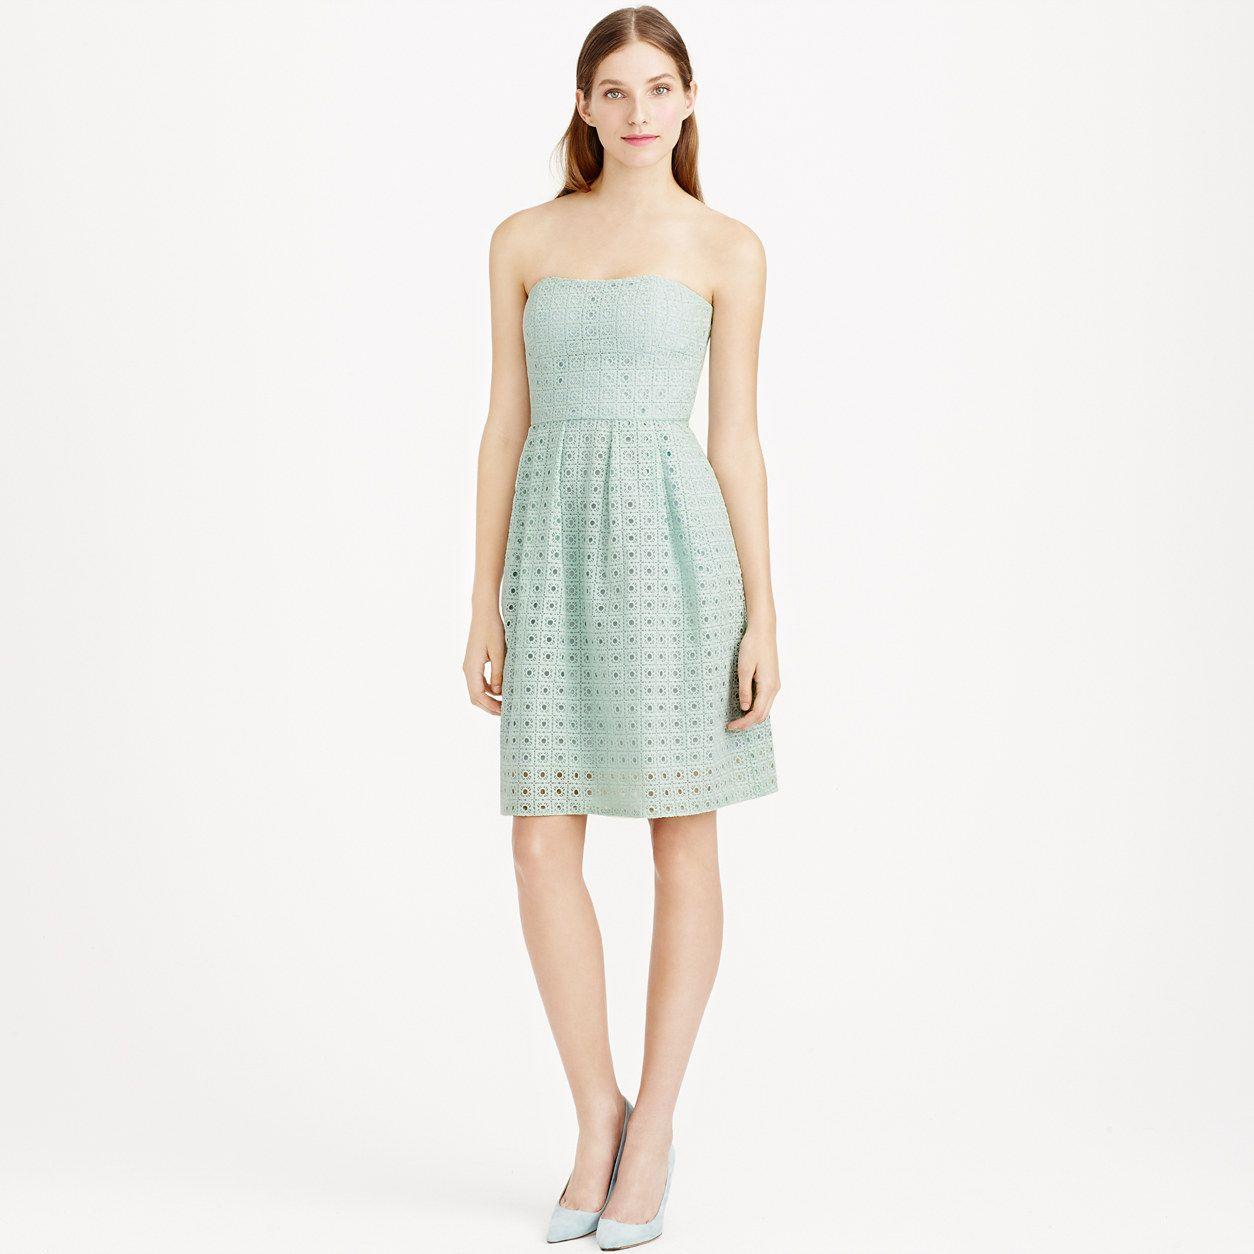 Green dress for wedding party  Hayley dress in organza eyelet  Bridesmaid  JCrew  Wardrobe